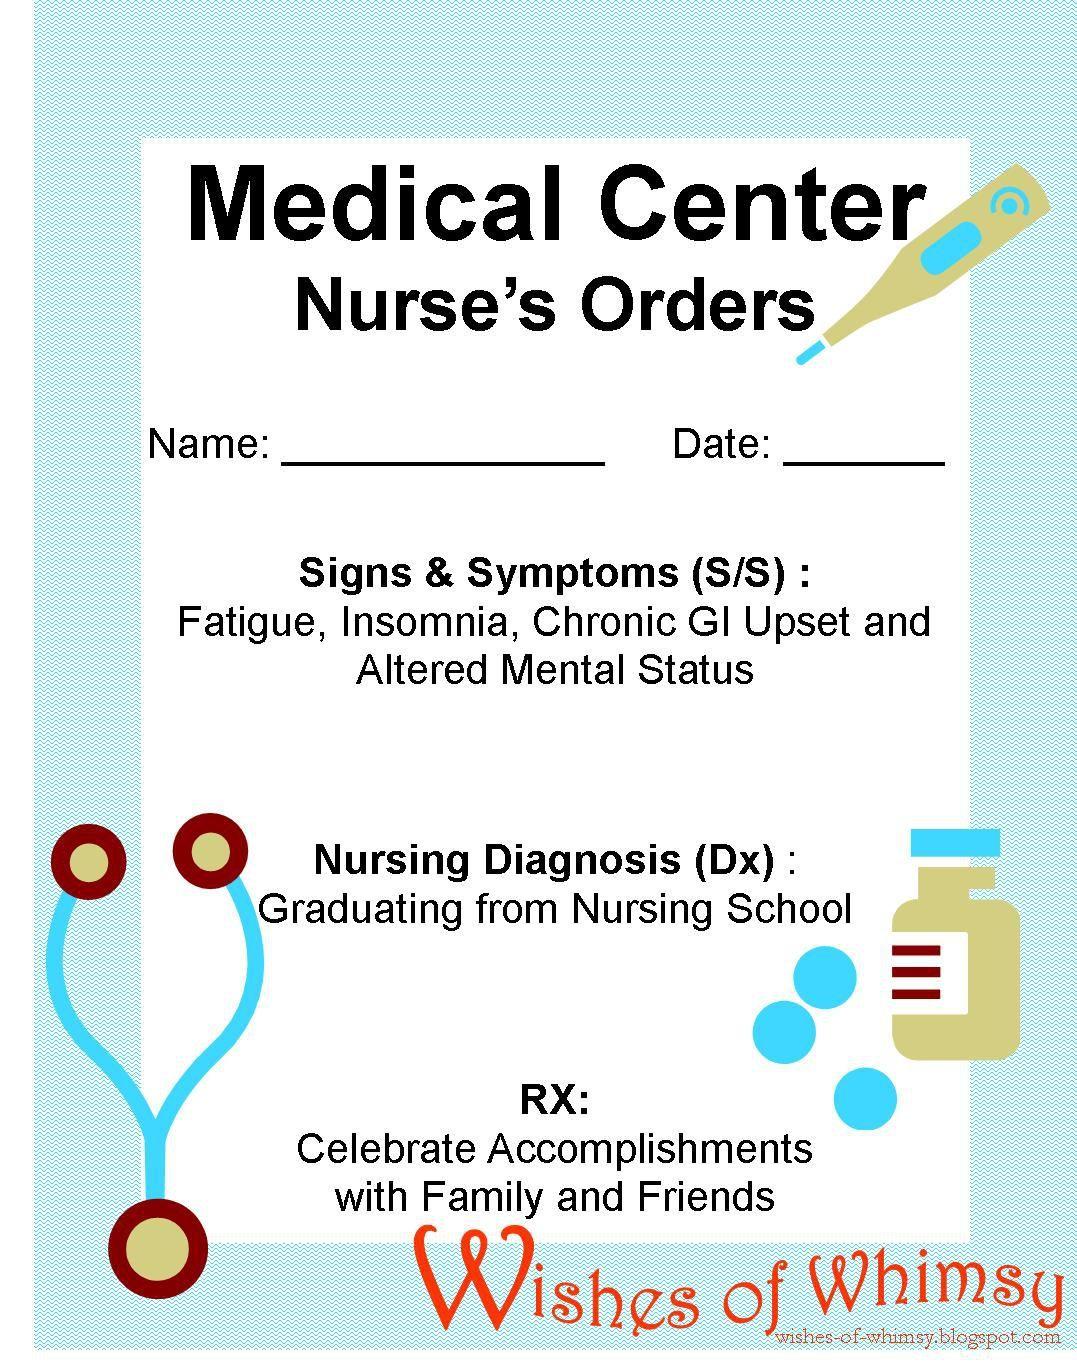 wording for nursing pinning ceremony invitations – Ceremony Invitation Template